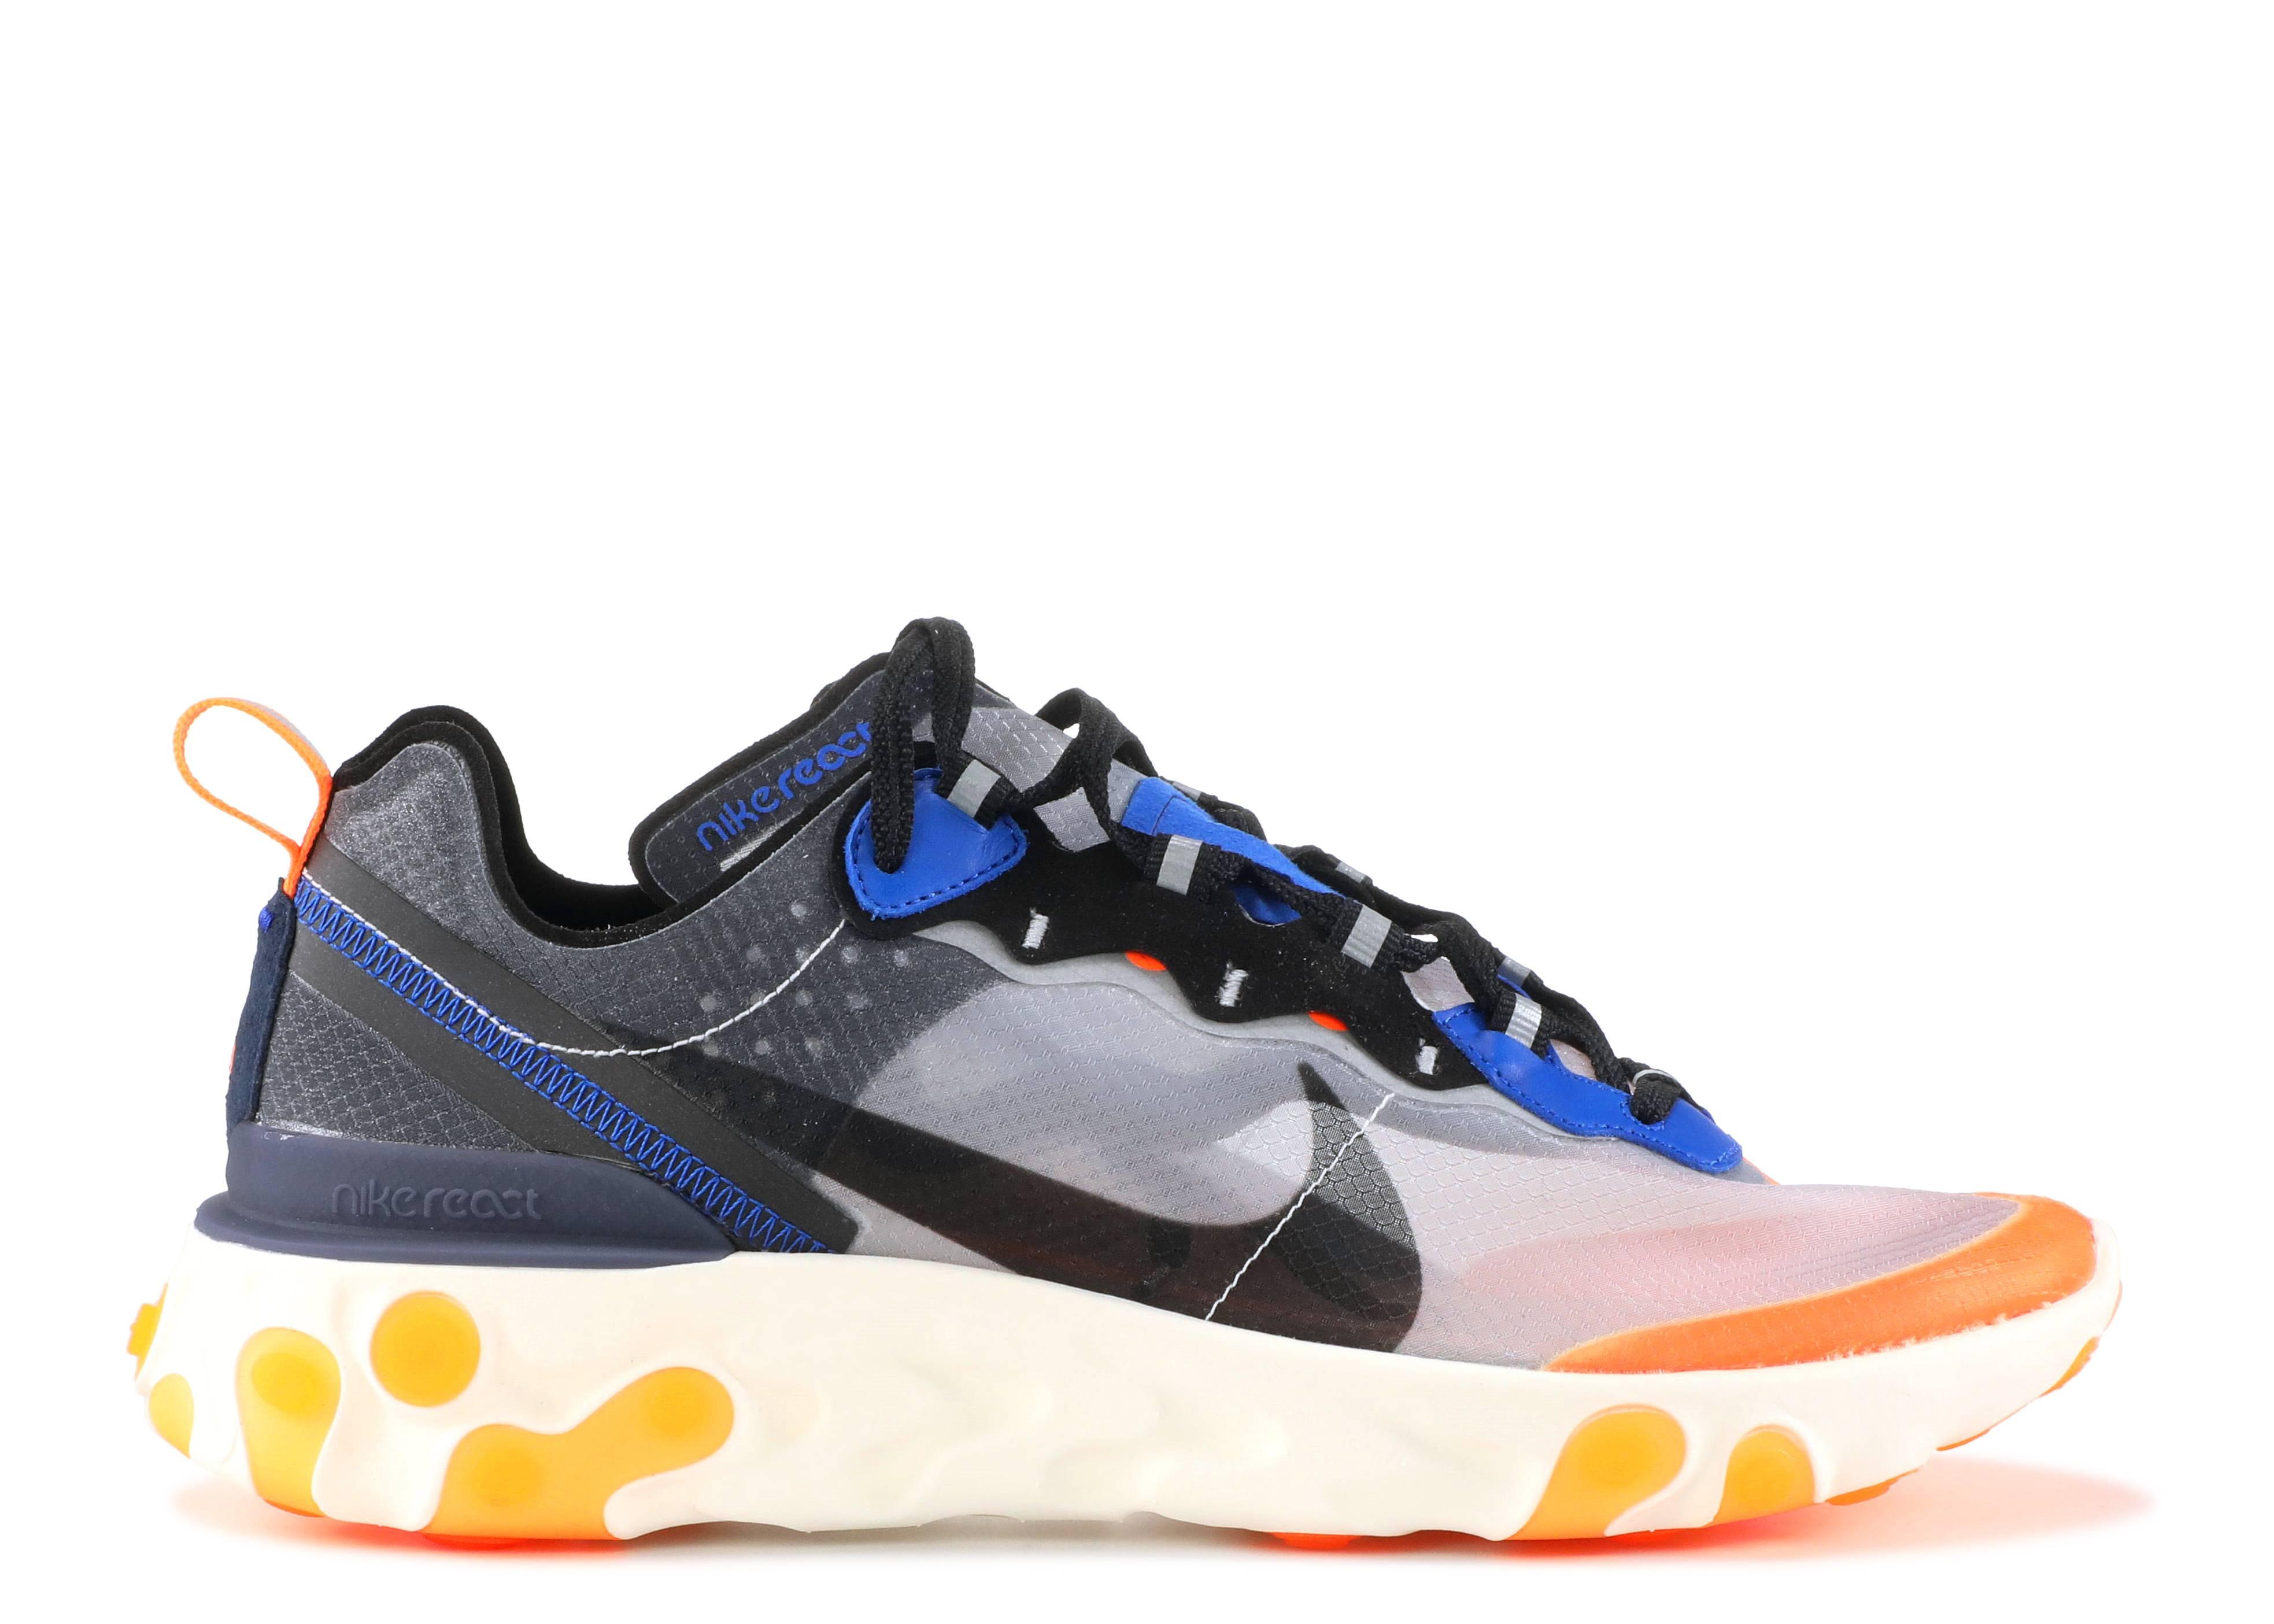 1a416101fef9 Nike React Element 87 - Nike - aq1090 004 - wolf grey black-thunder ...